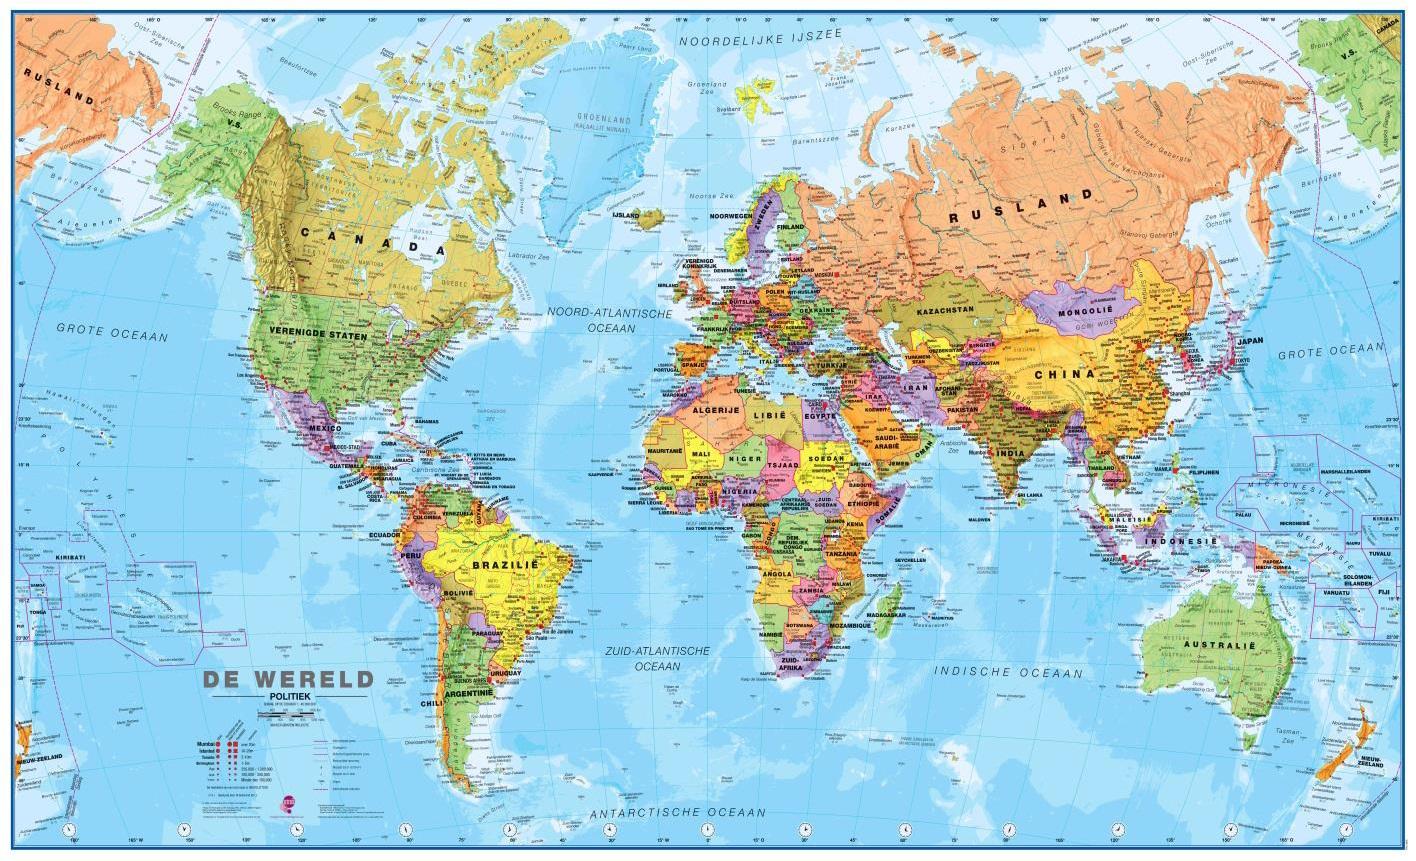 Wereldkaart 66P-zvl Politiek, 136 x 86 cm | Maps International de zwerver